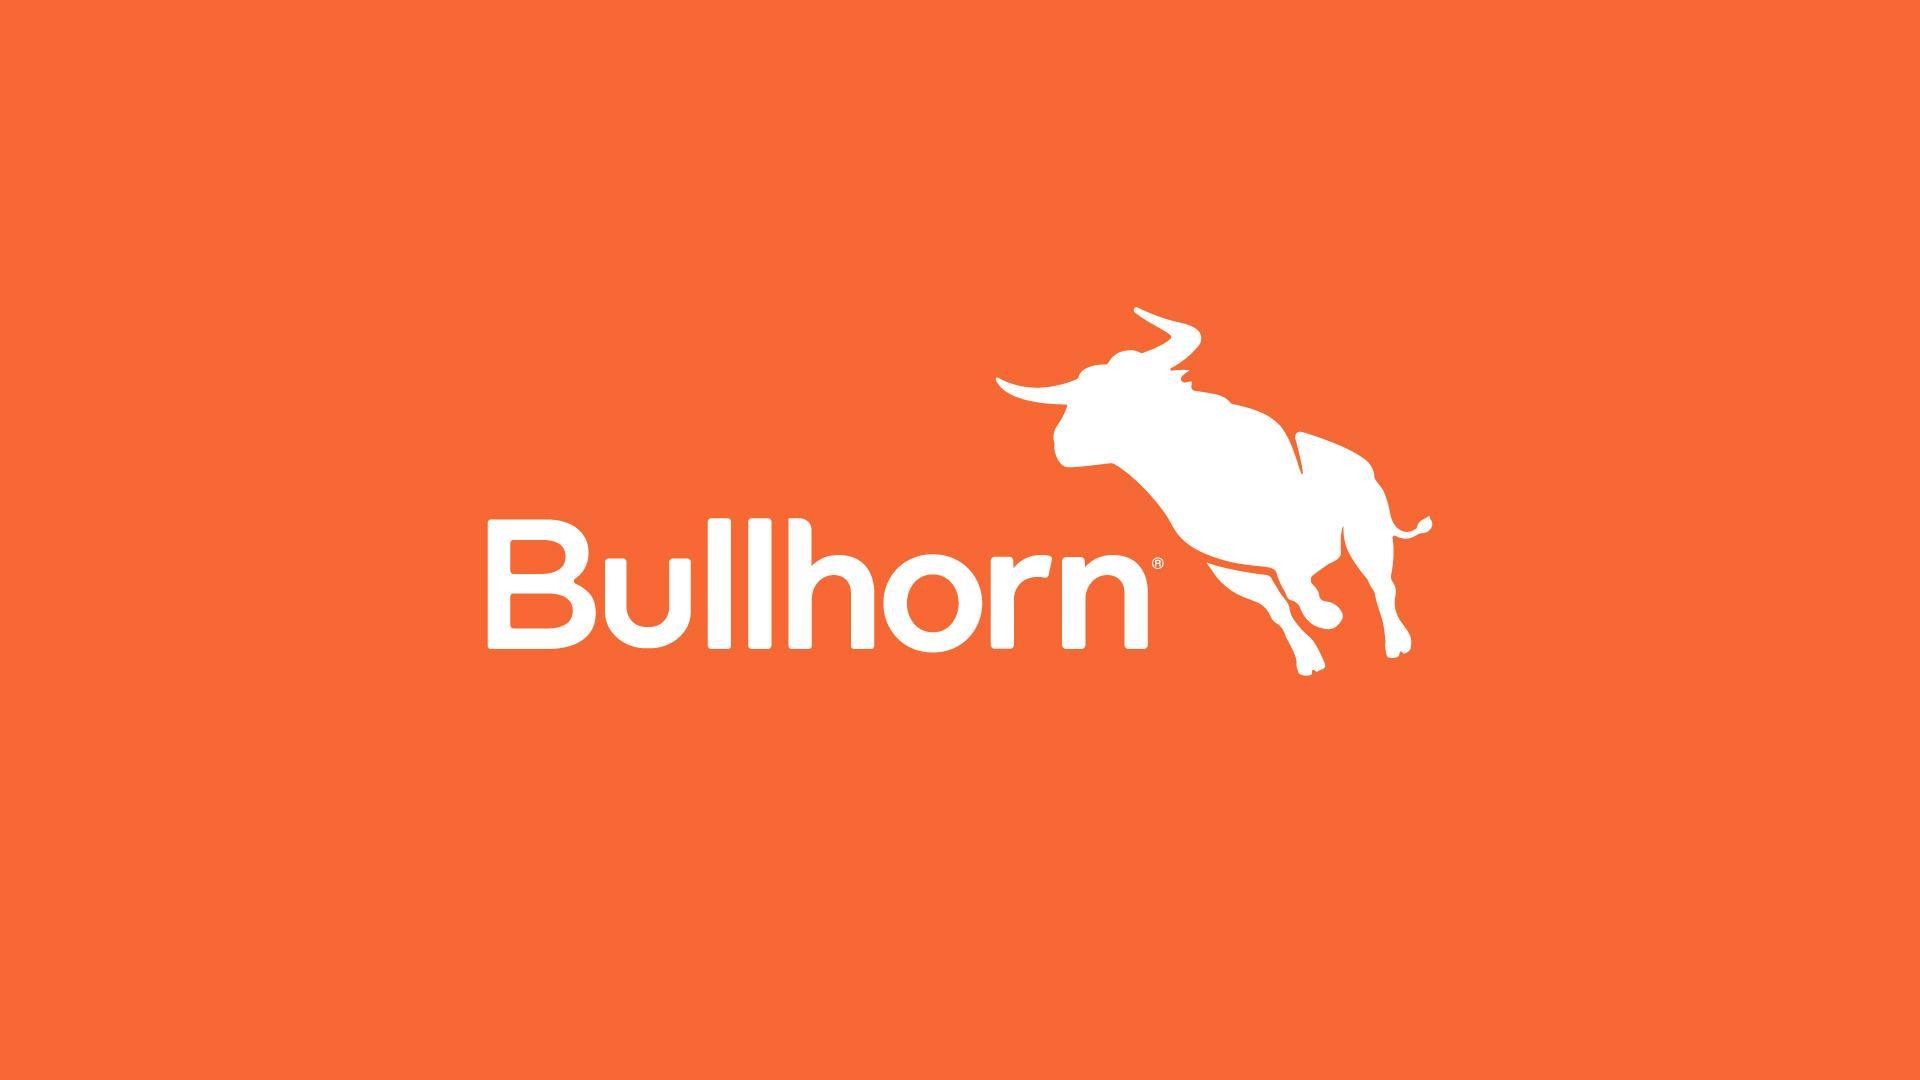 Review Bullhorn: Applicant Tracking (ATS) Software - appvizer